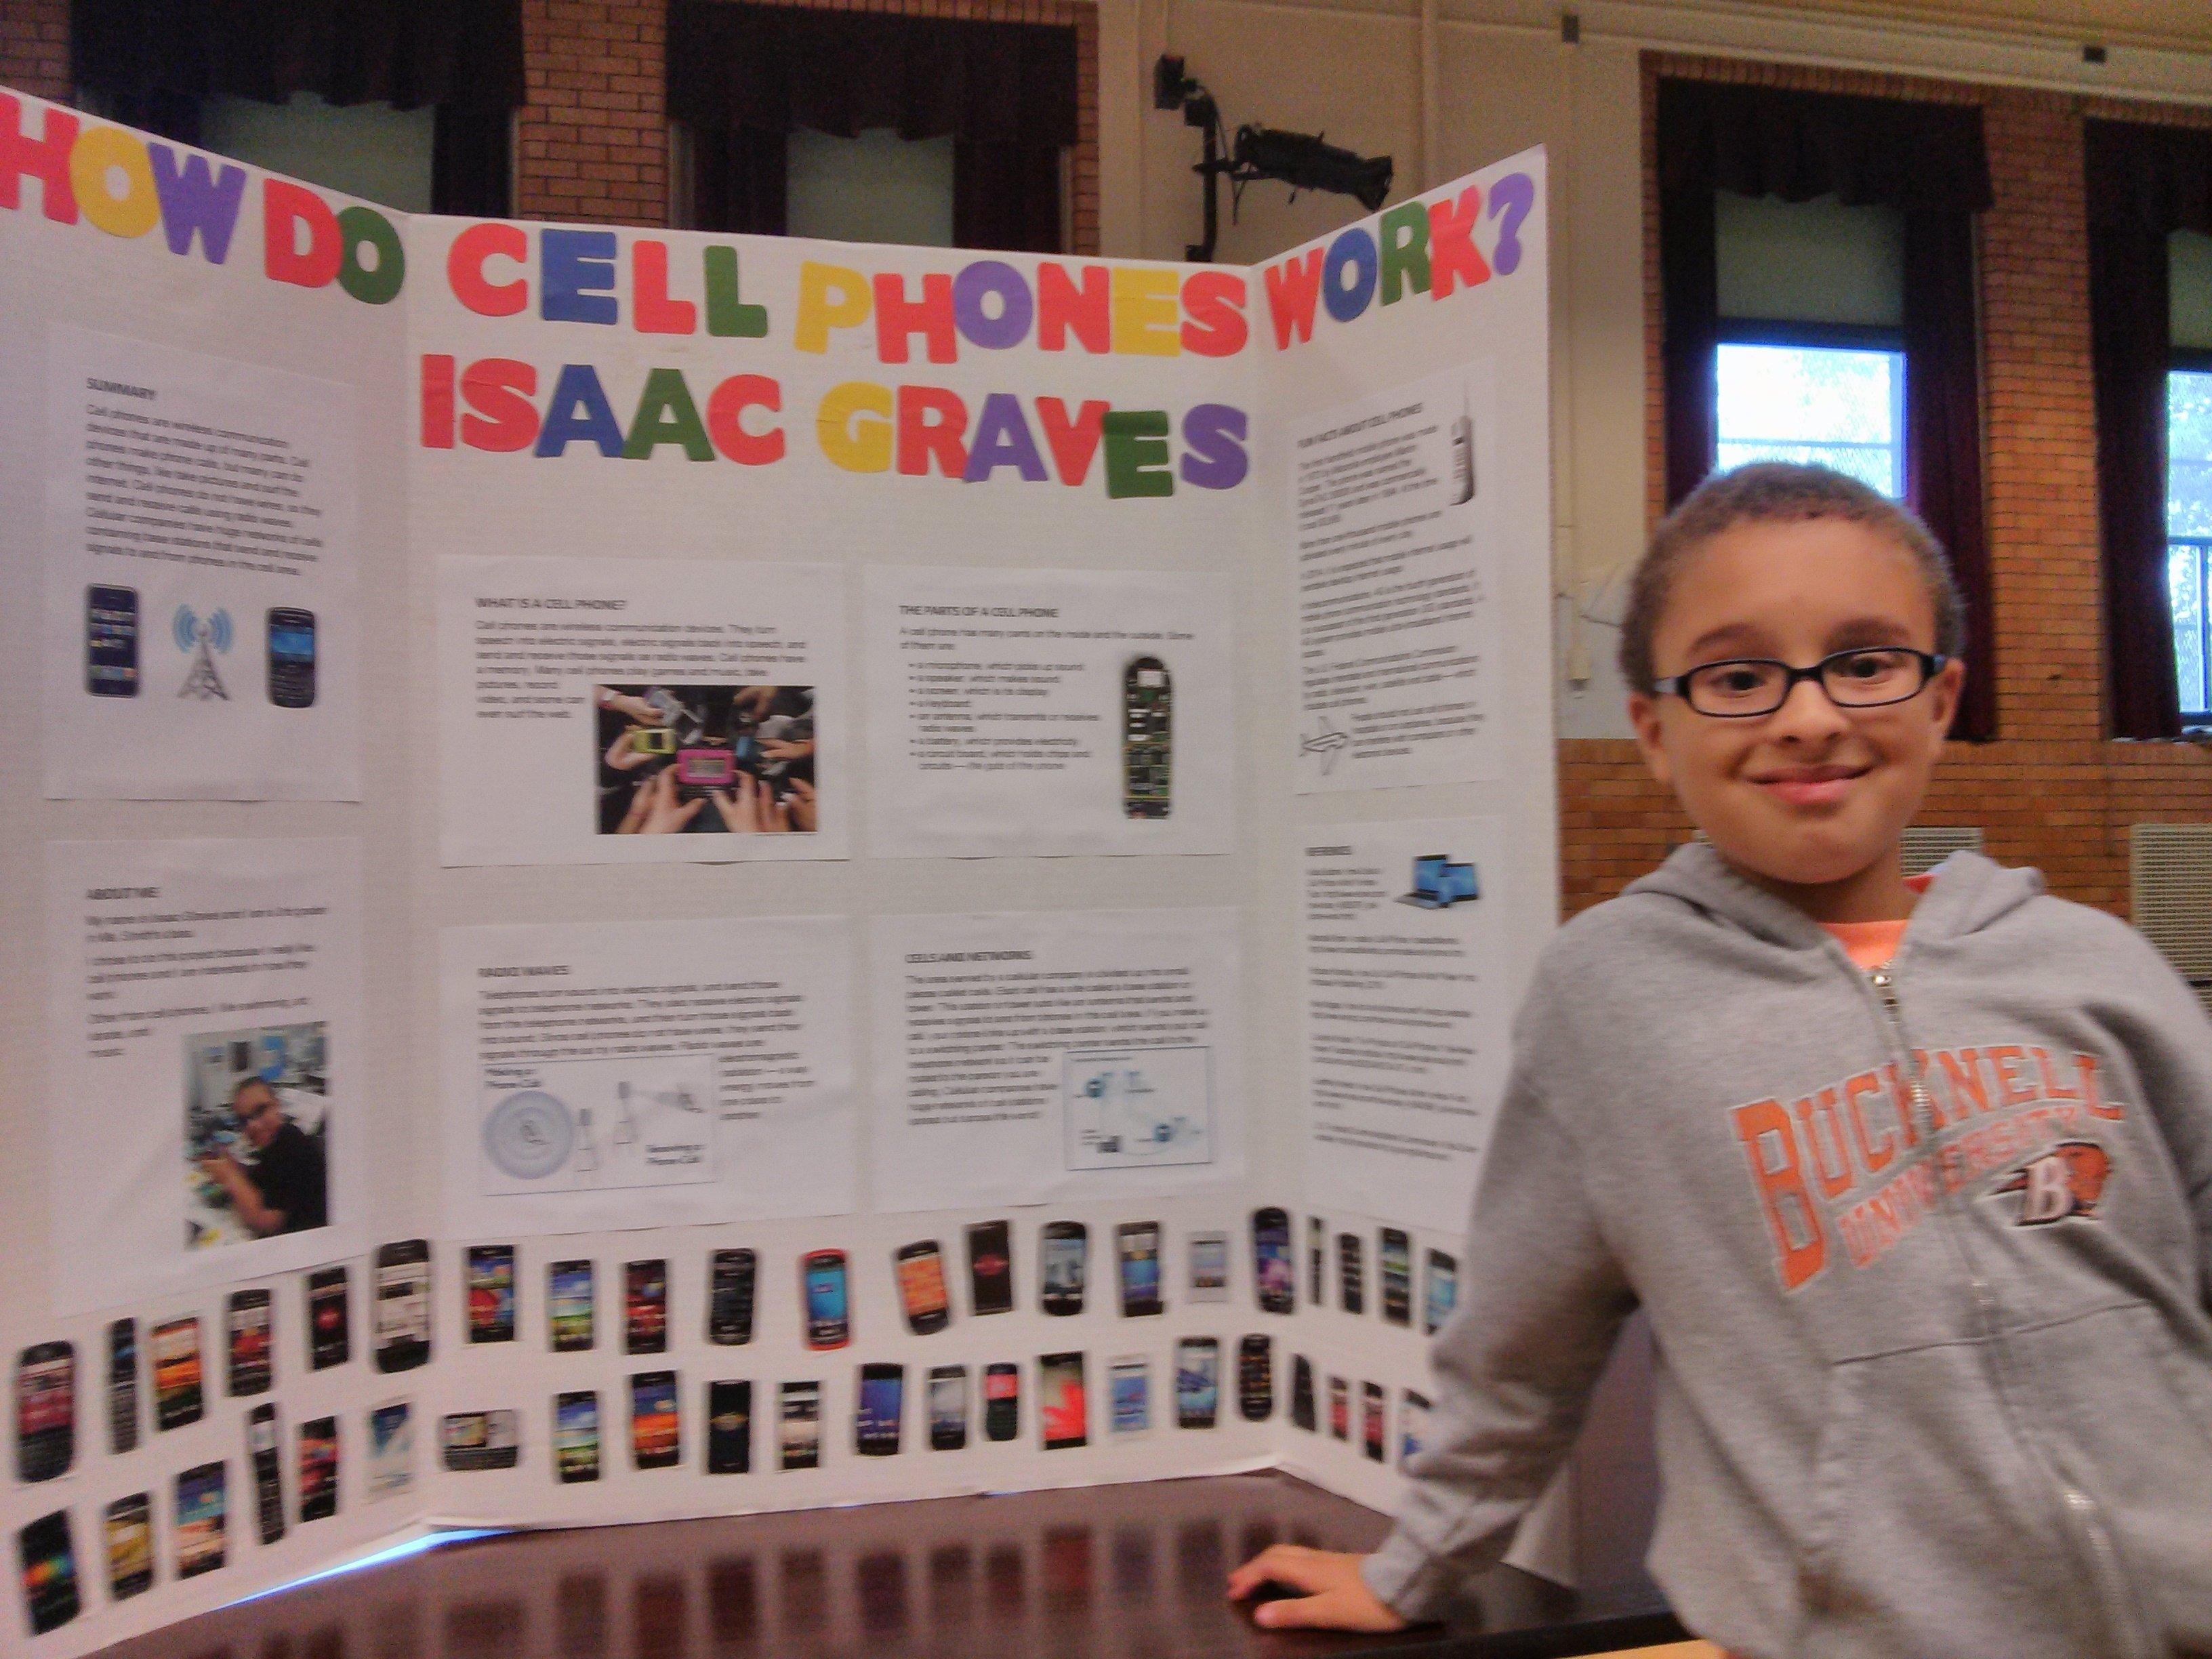 10 Nice Third Grade Science Fair Project Ideas third grade science projects research paper academic service 3 2020